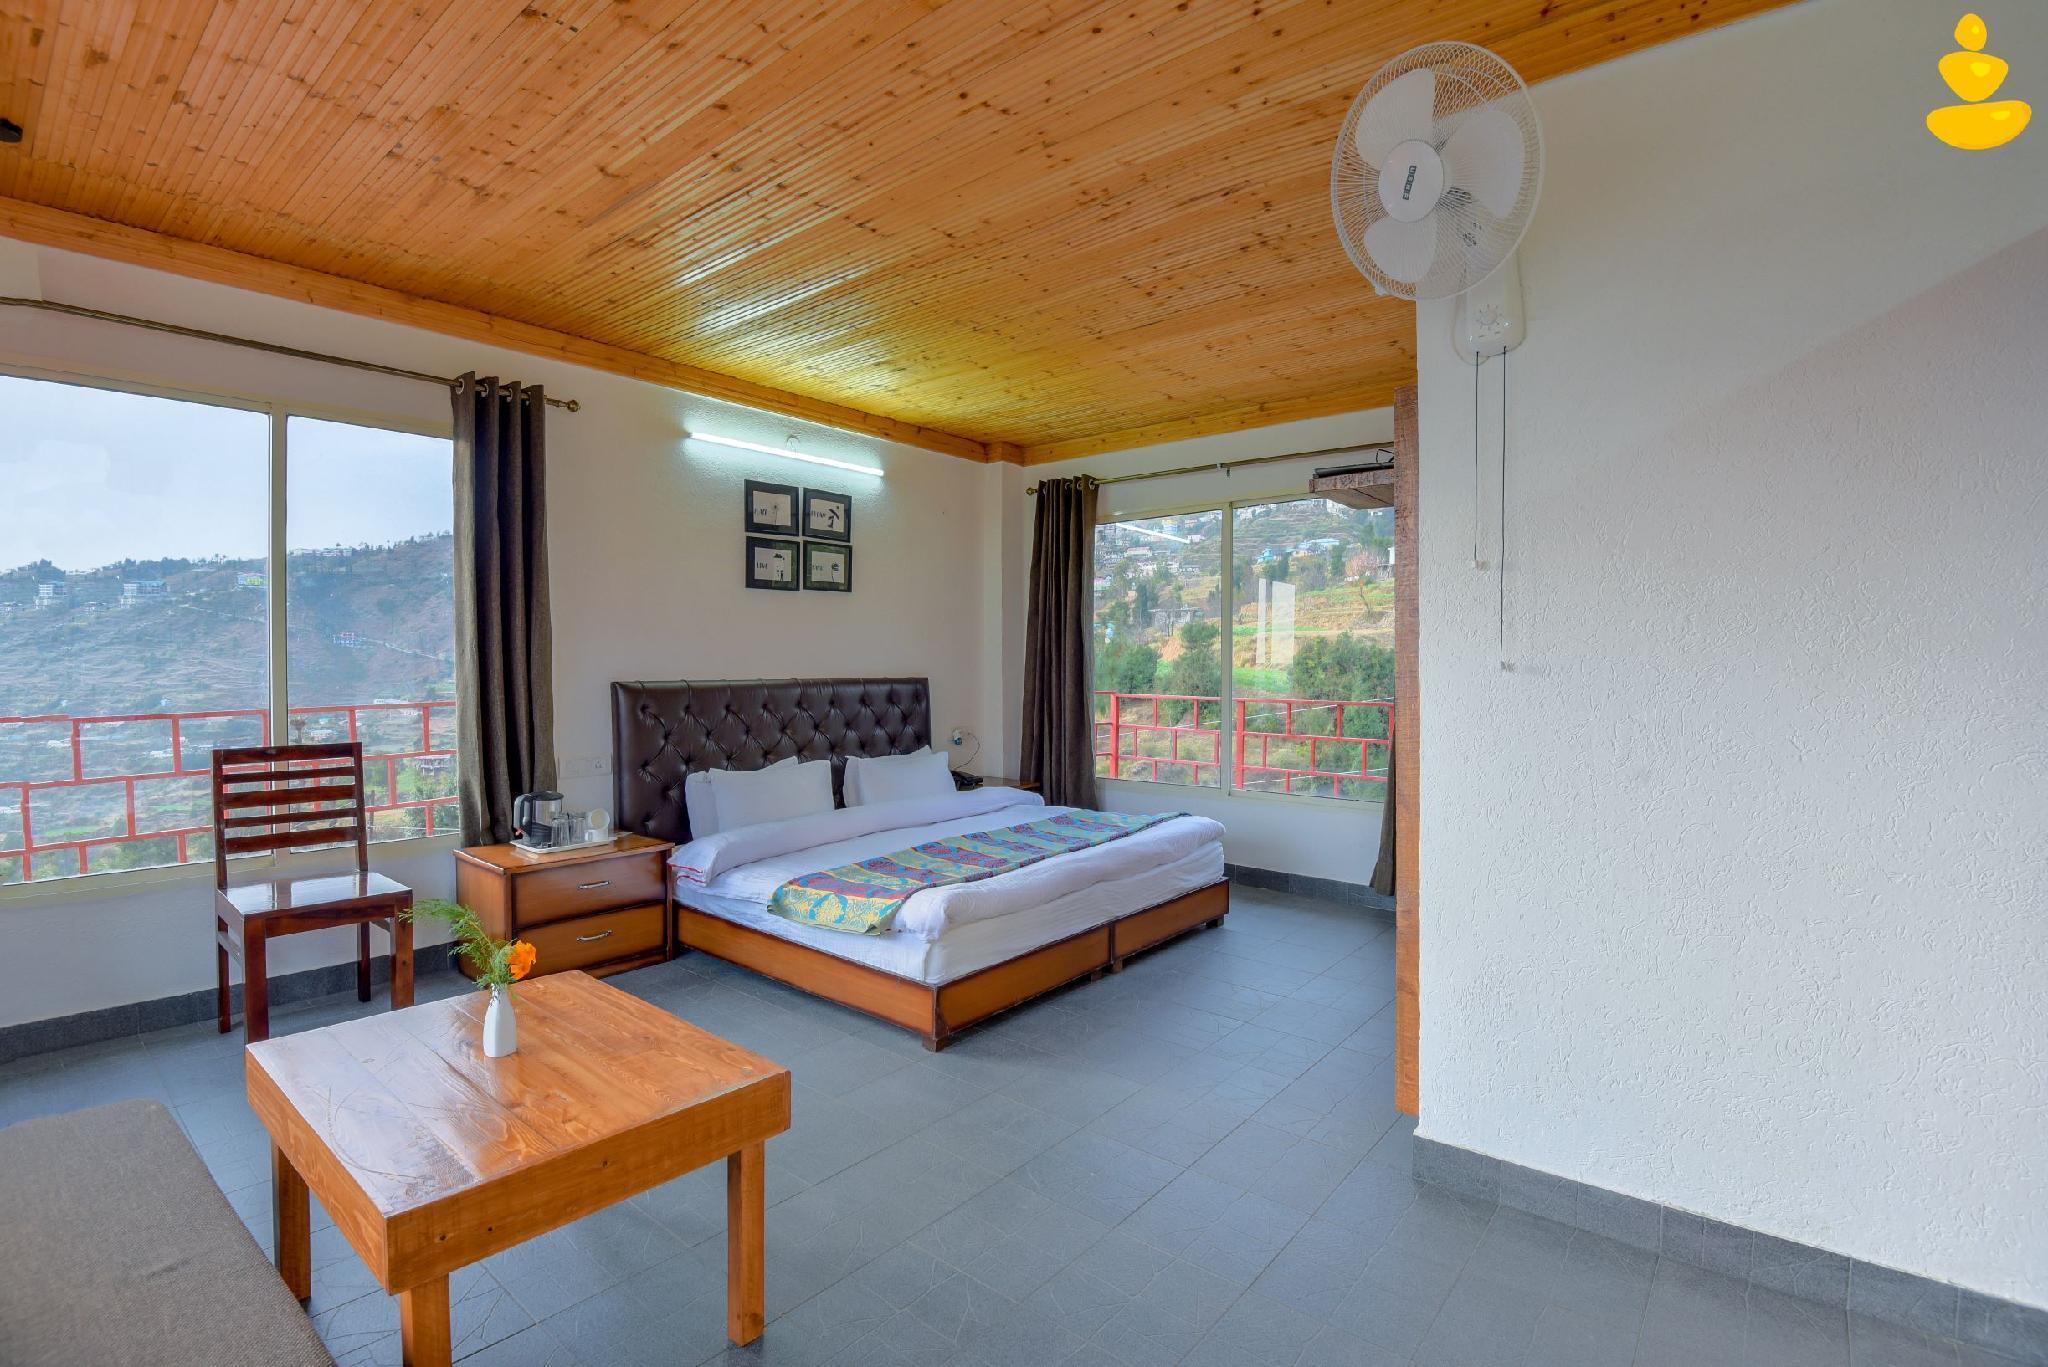 LivingStone   Eco Resort   Super Deluxe Room